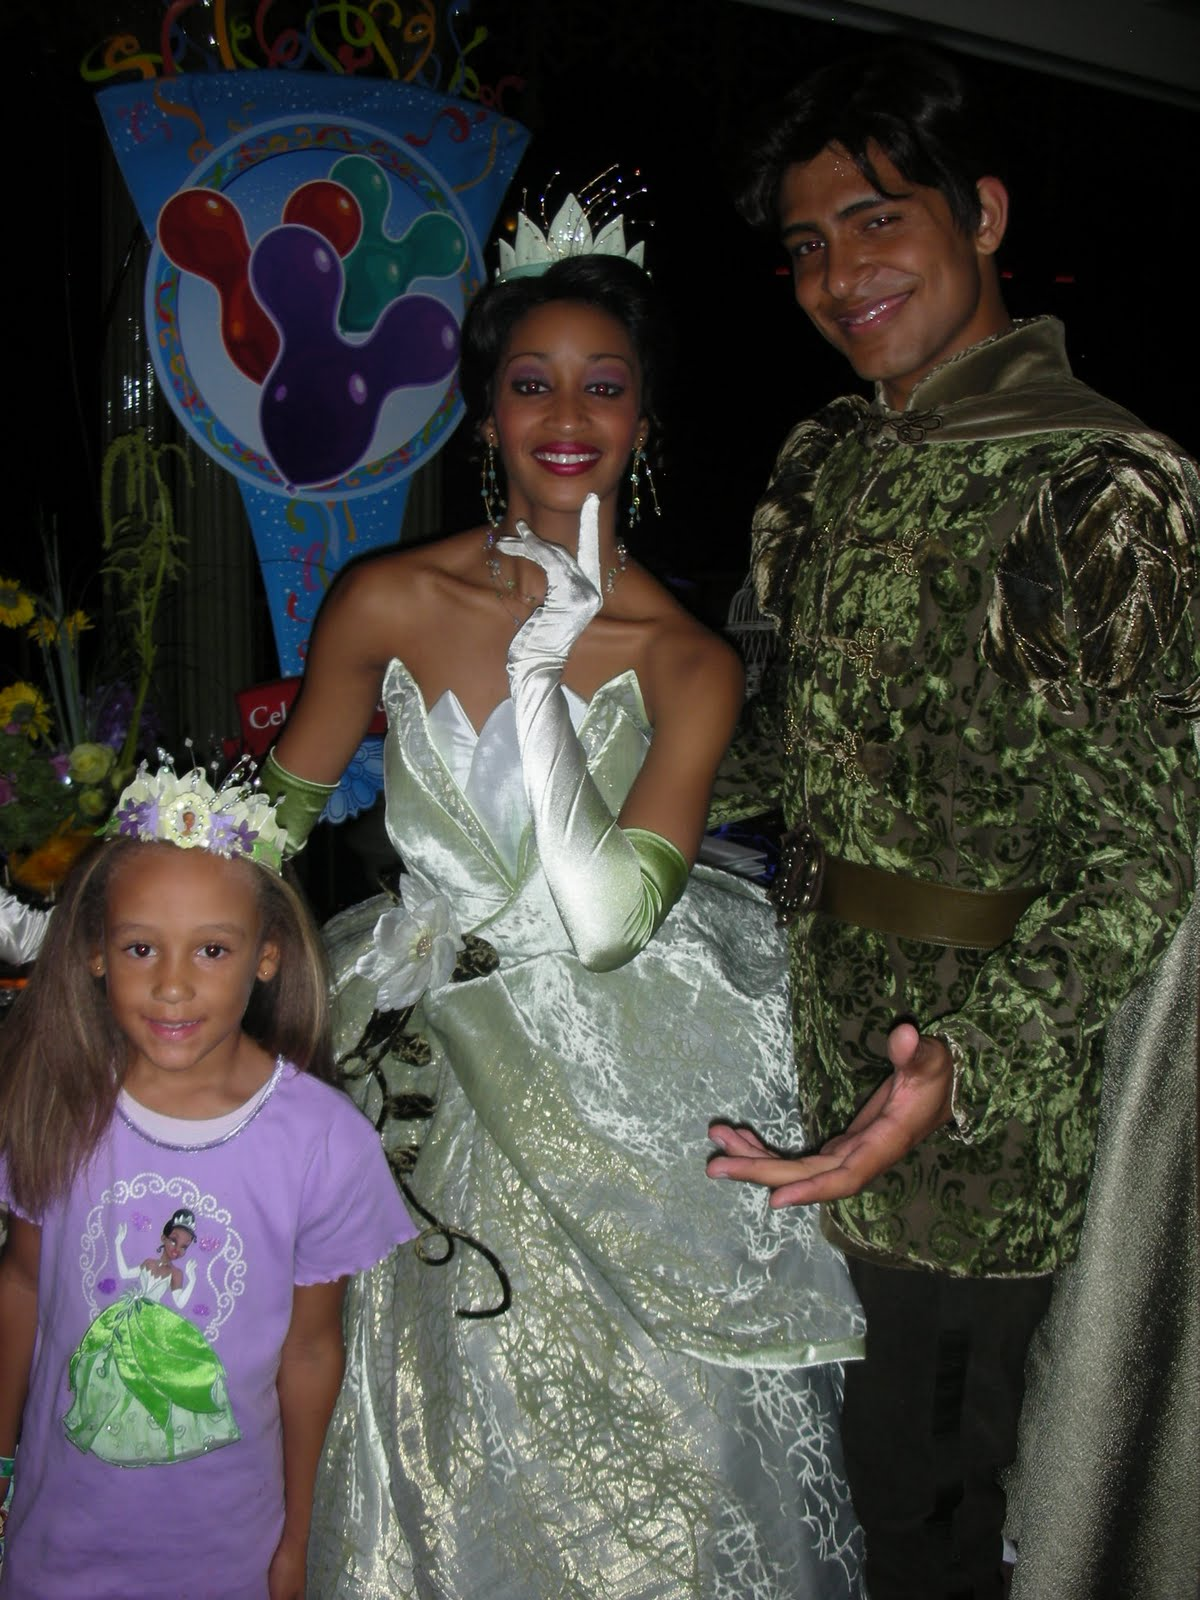 Princess Tiana And Prince Naveen Disneyland